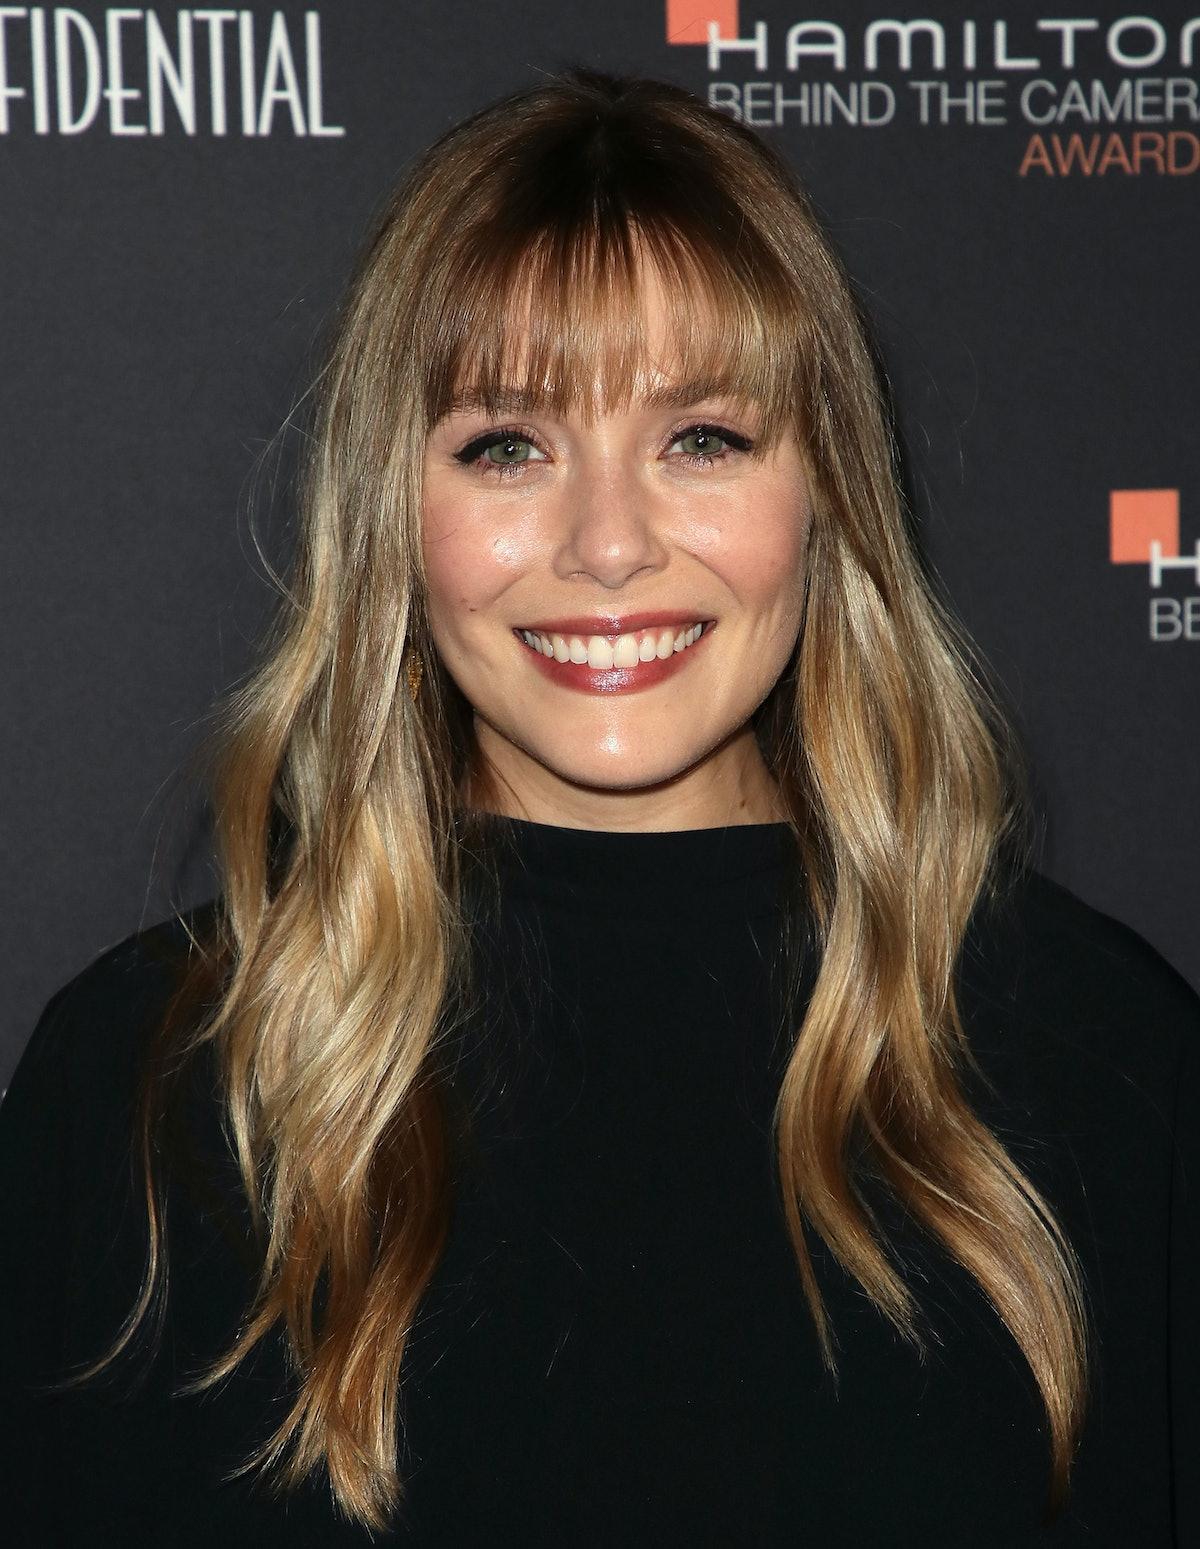 LOS ANGELES, CA - NOVEMBER 04:  Elizabeth Olsen attends the 10th Hamilton Behind The Camera Awards a...